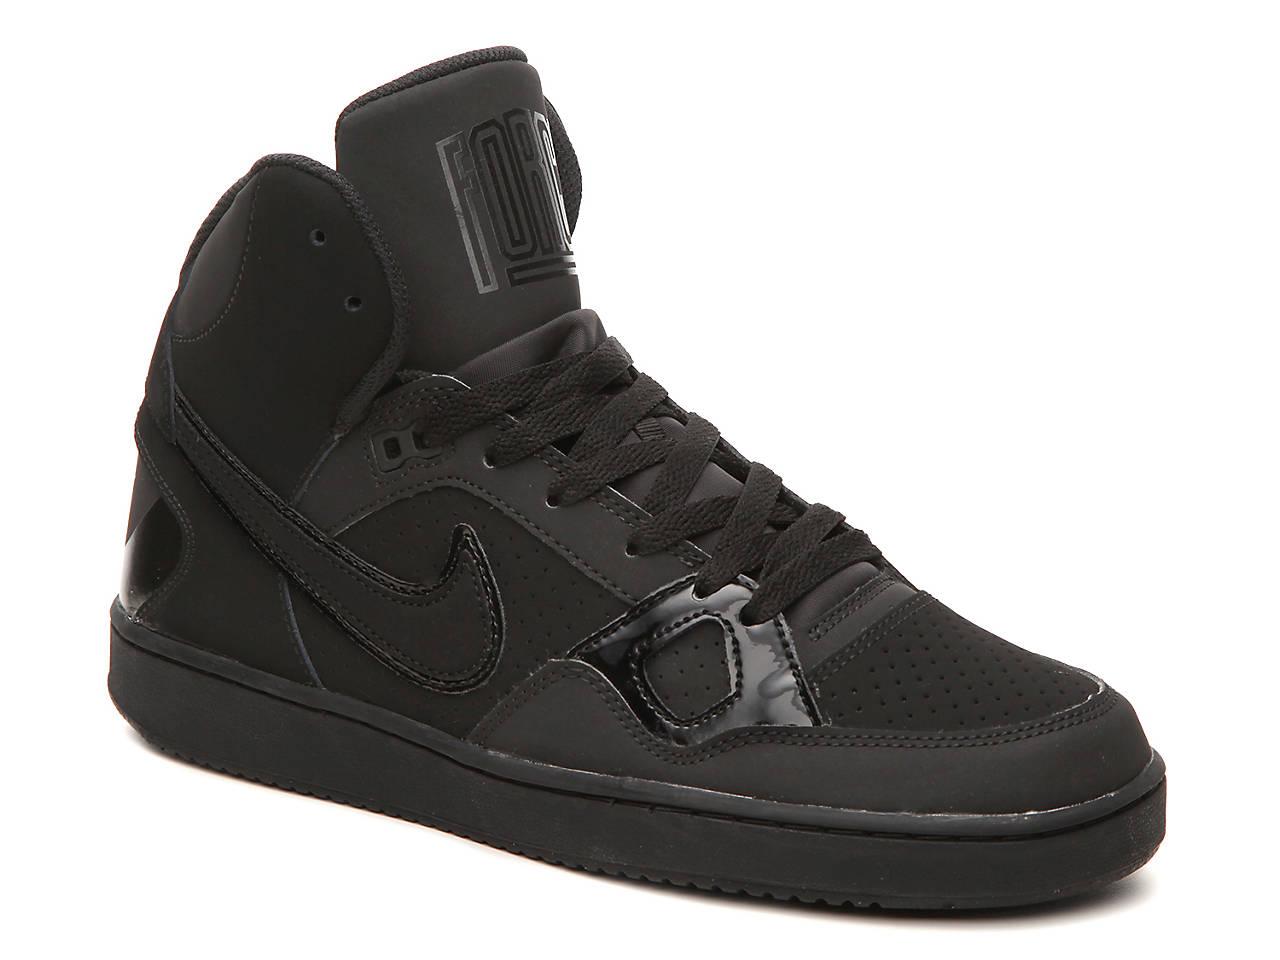 1b8e5df87046 Nike Son Of Force High-Top Sneaker - Men s Men s Shoes